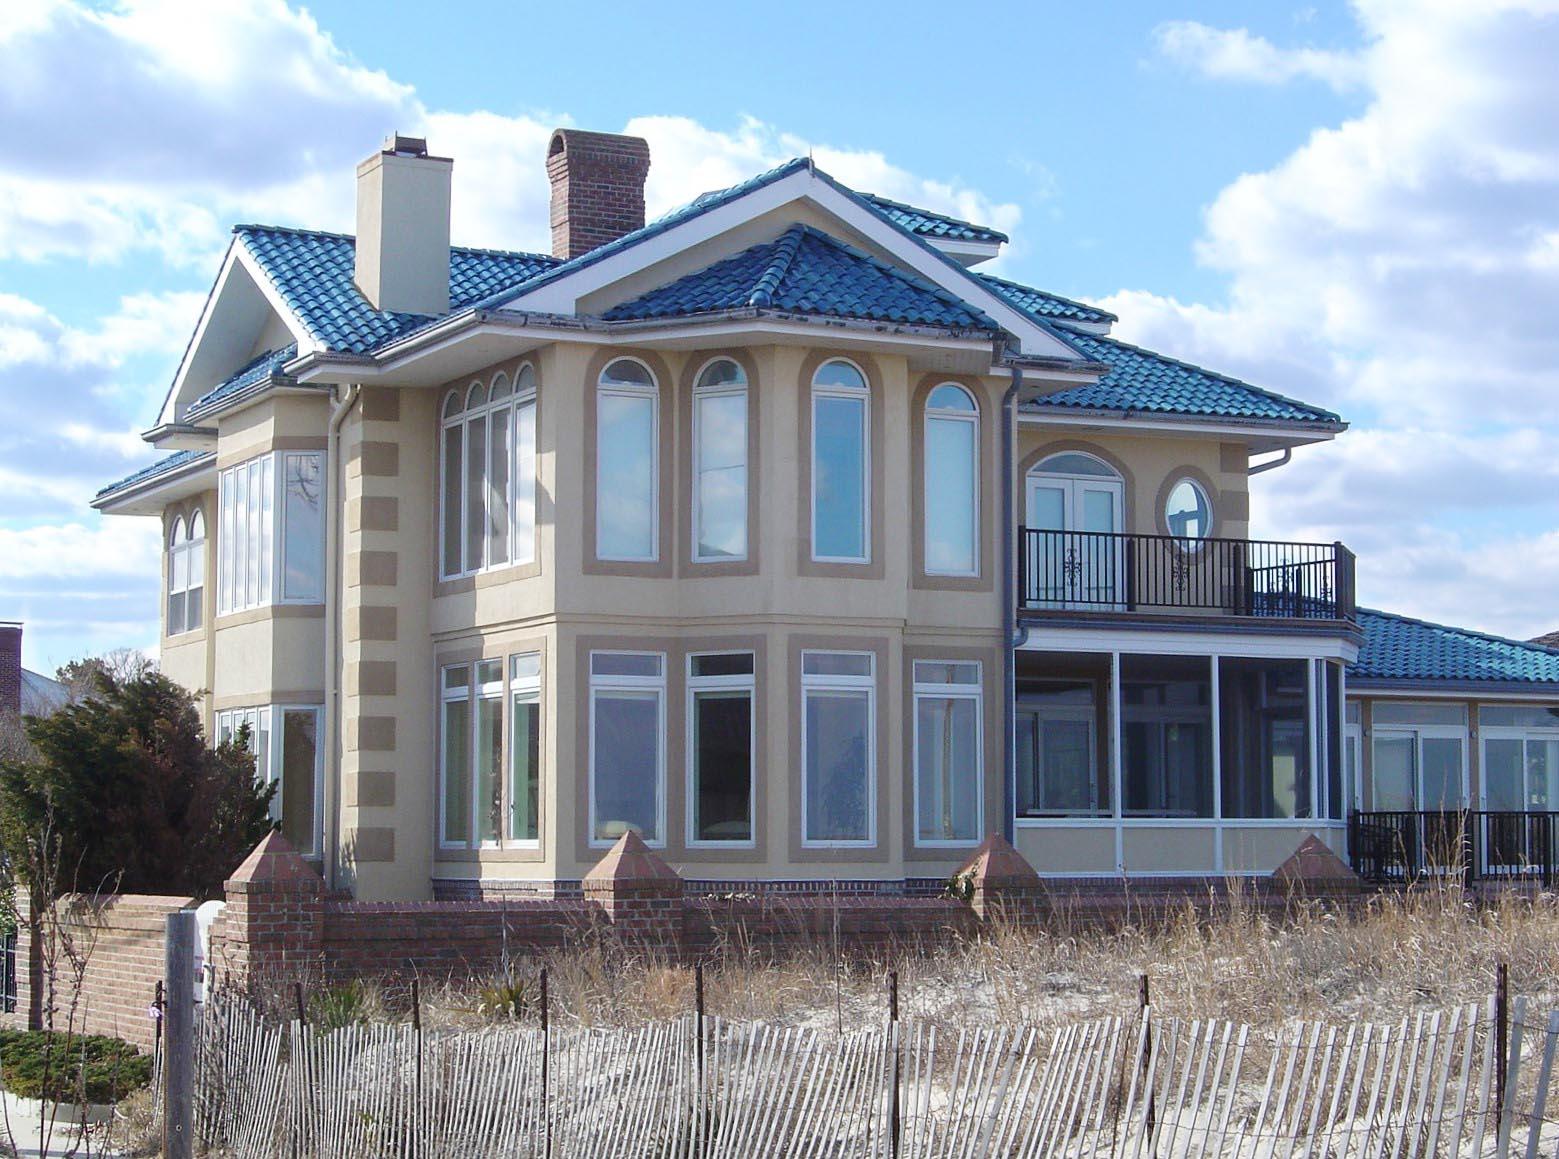 Rehoboth Beach Ludowici Roof Tile